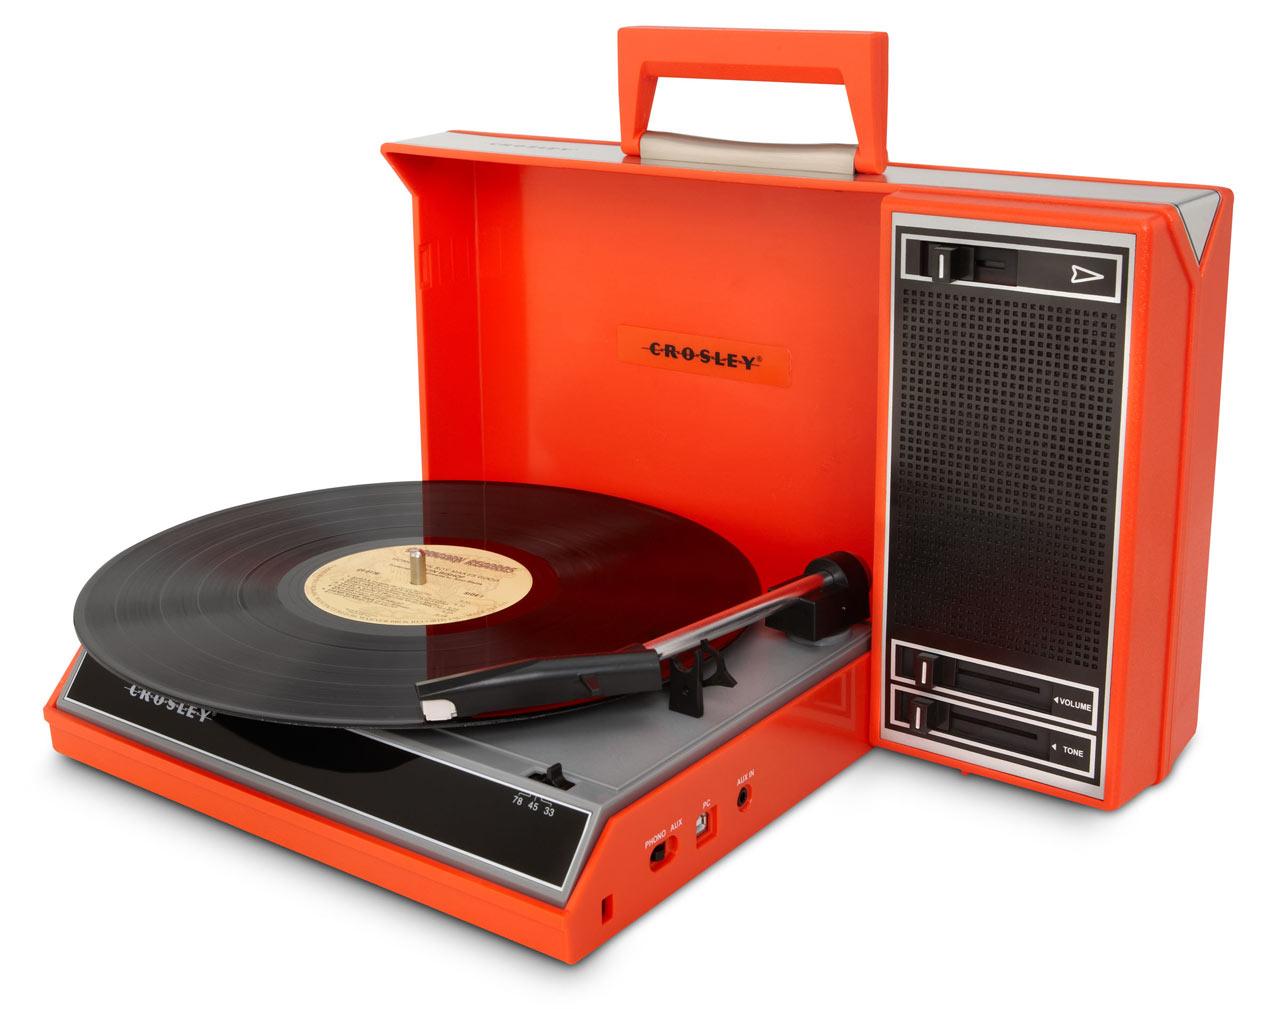 crosley-turntable-red